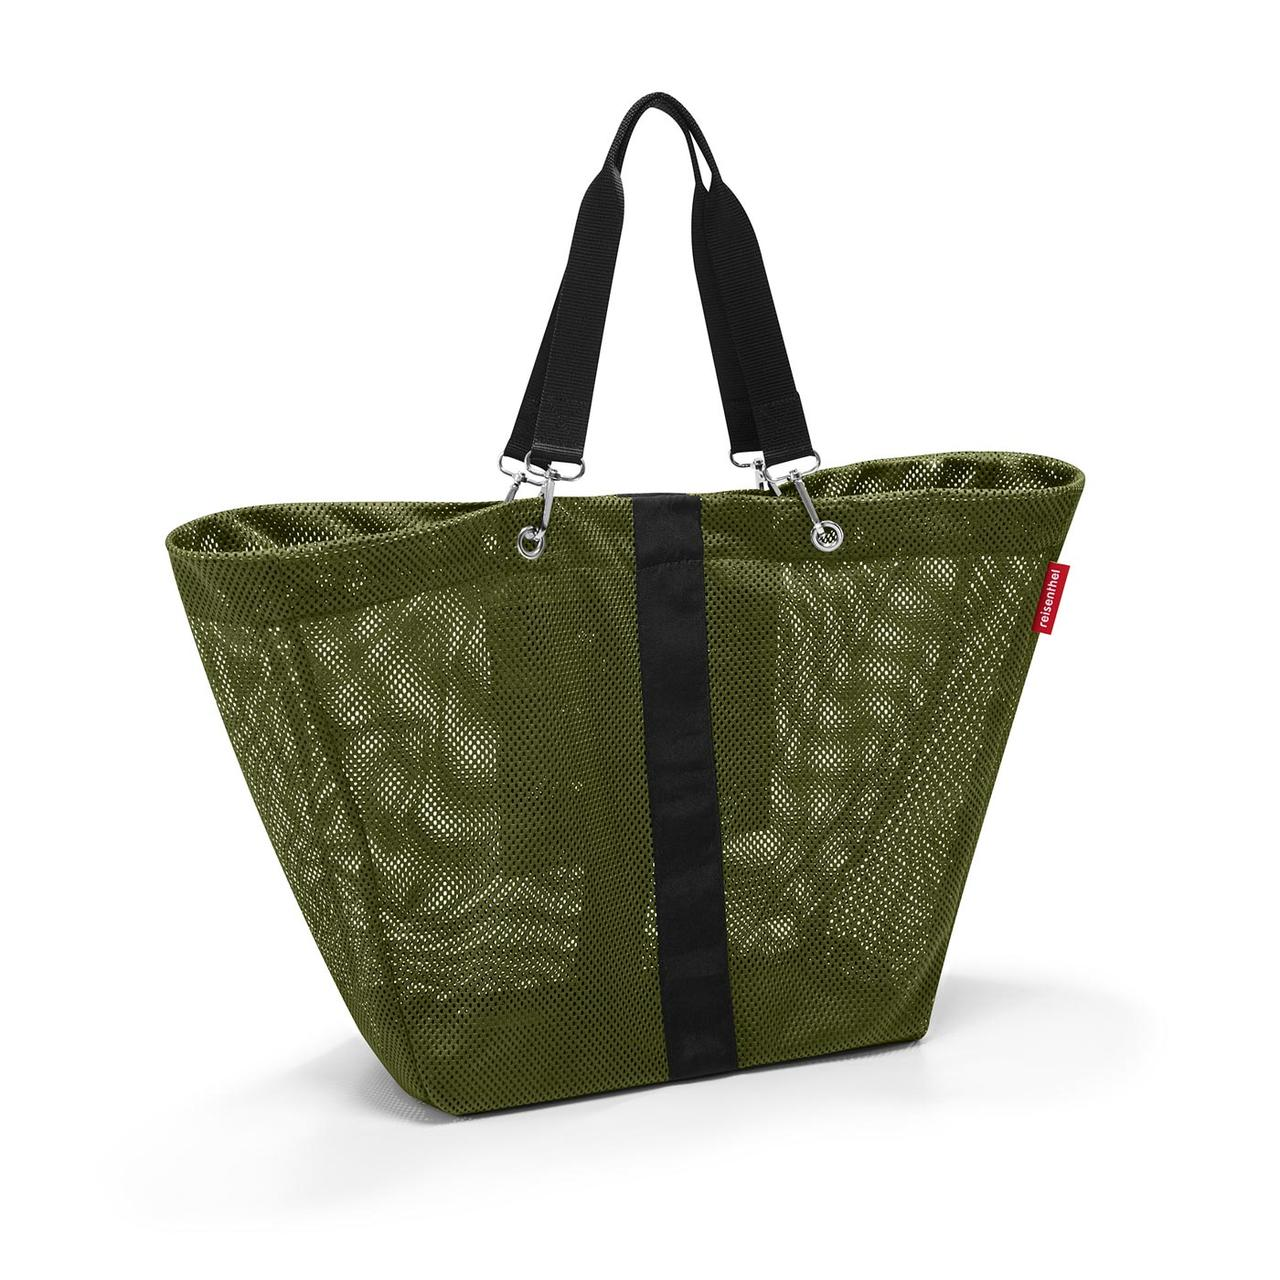 ba9d7b191b78 Плетеная сумка Reisenthel MD 5005, цена 1 223 грн., купить в Киеве —  Prom.ua (ID#571058731)